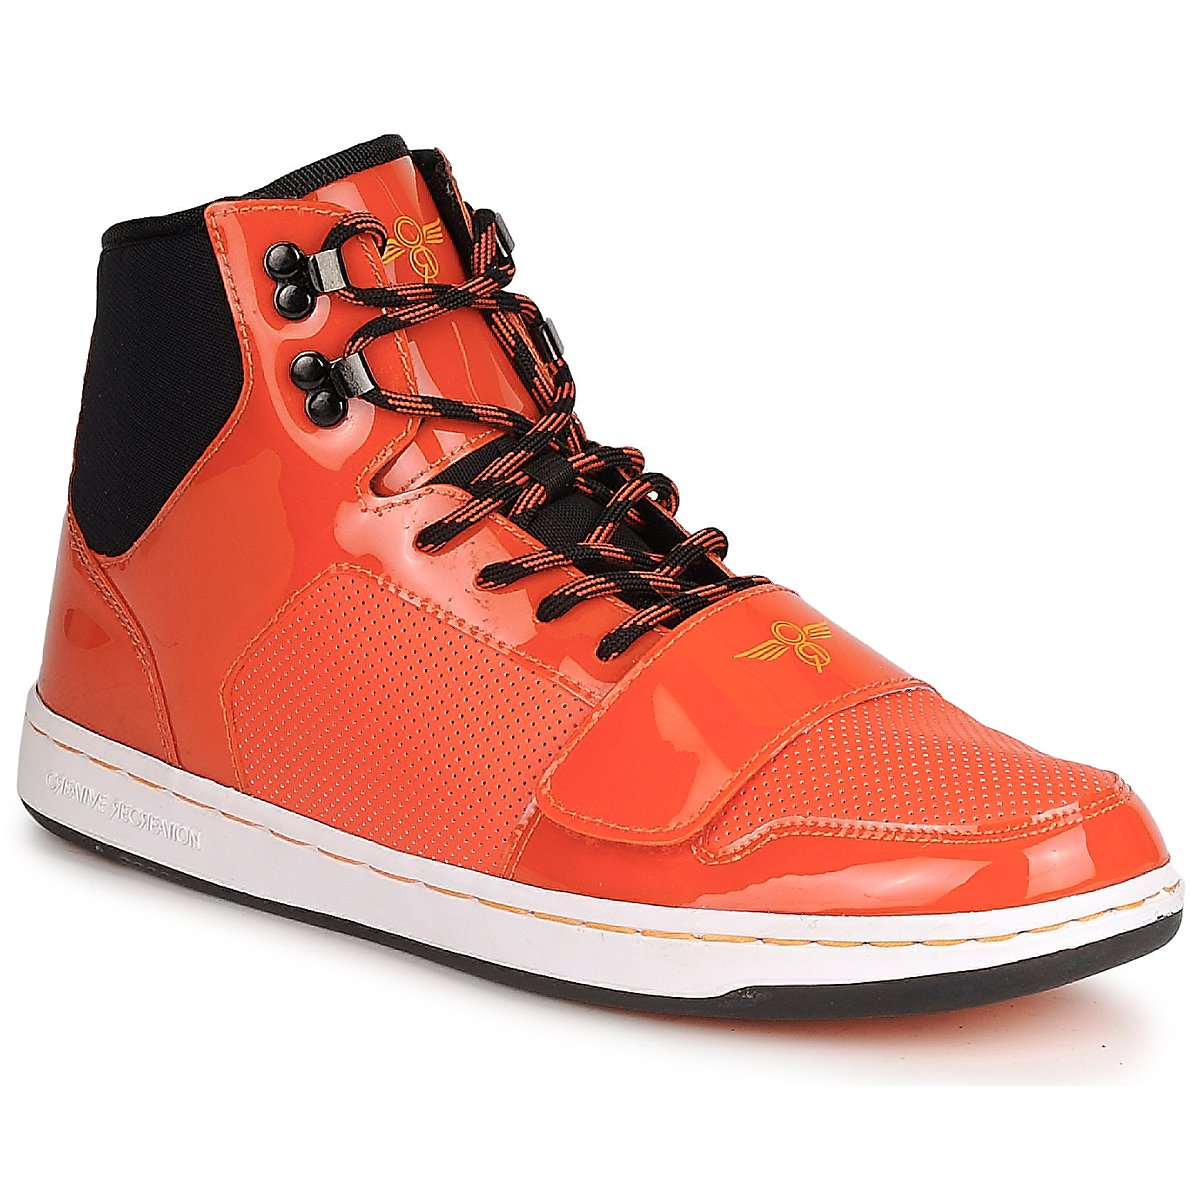 Creative Recreation W CESARIO Orange - Kostenloser Versand bei Spartoode ! - Schuhe Sneaker High Damen 42,50 €